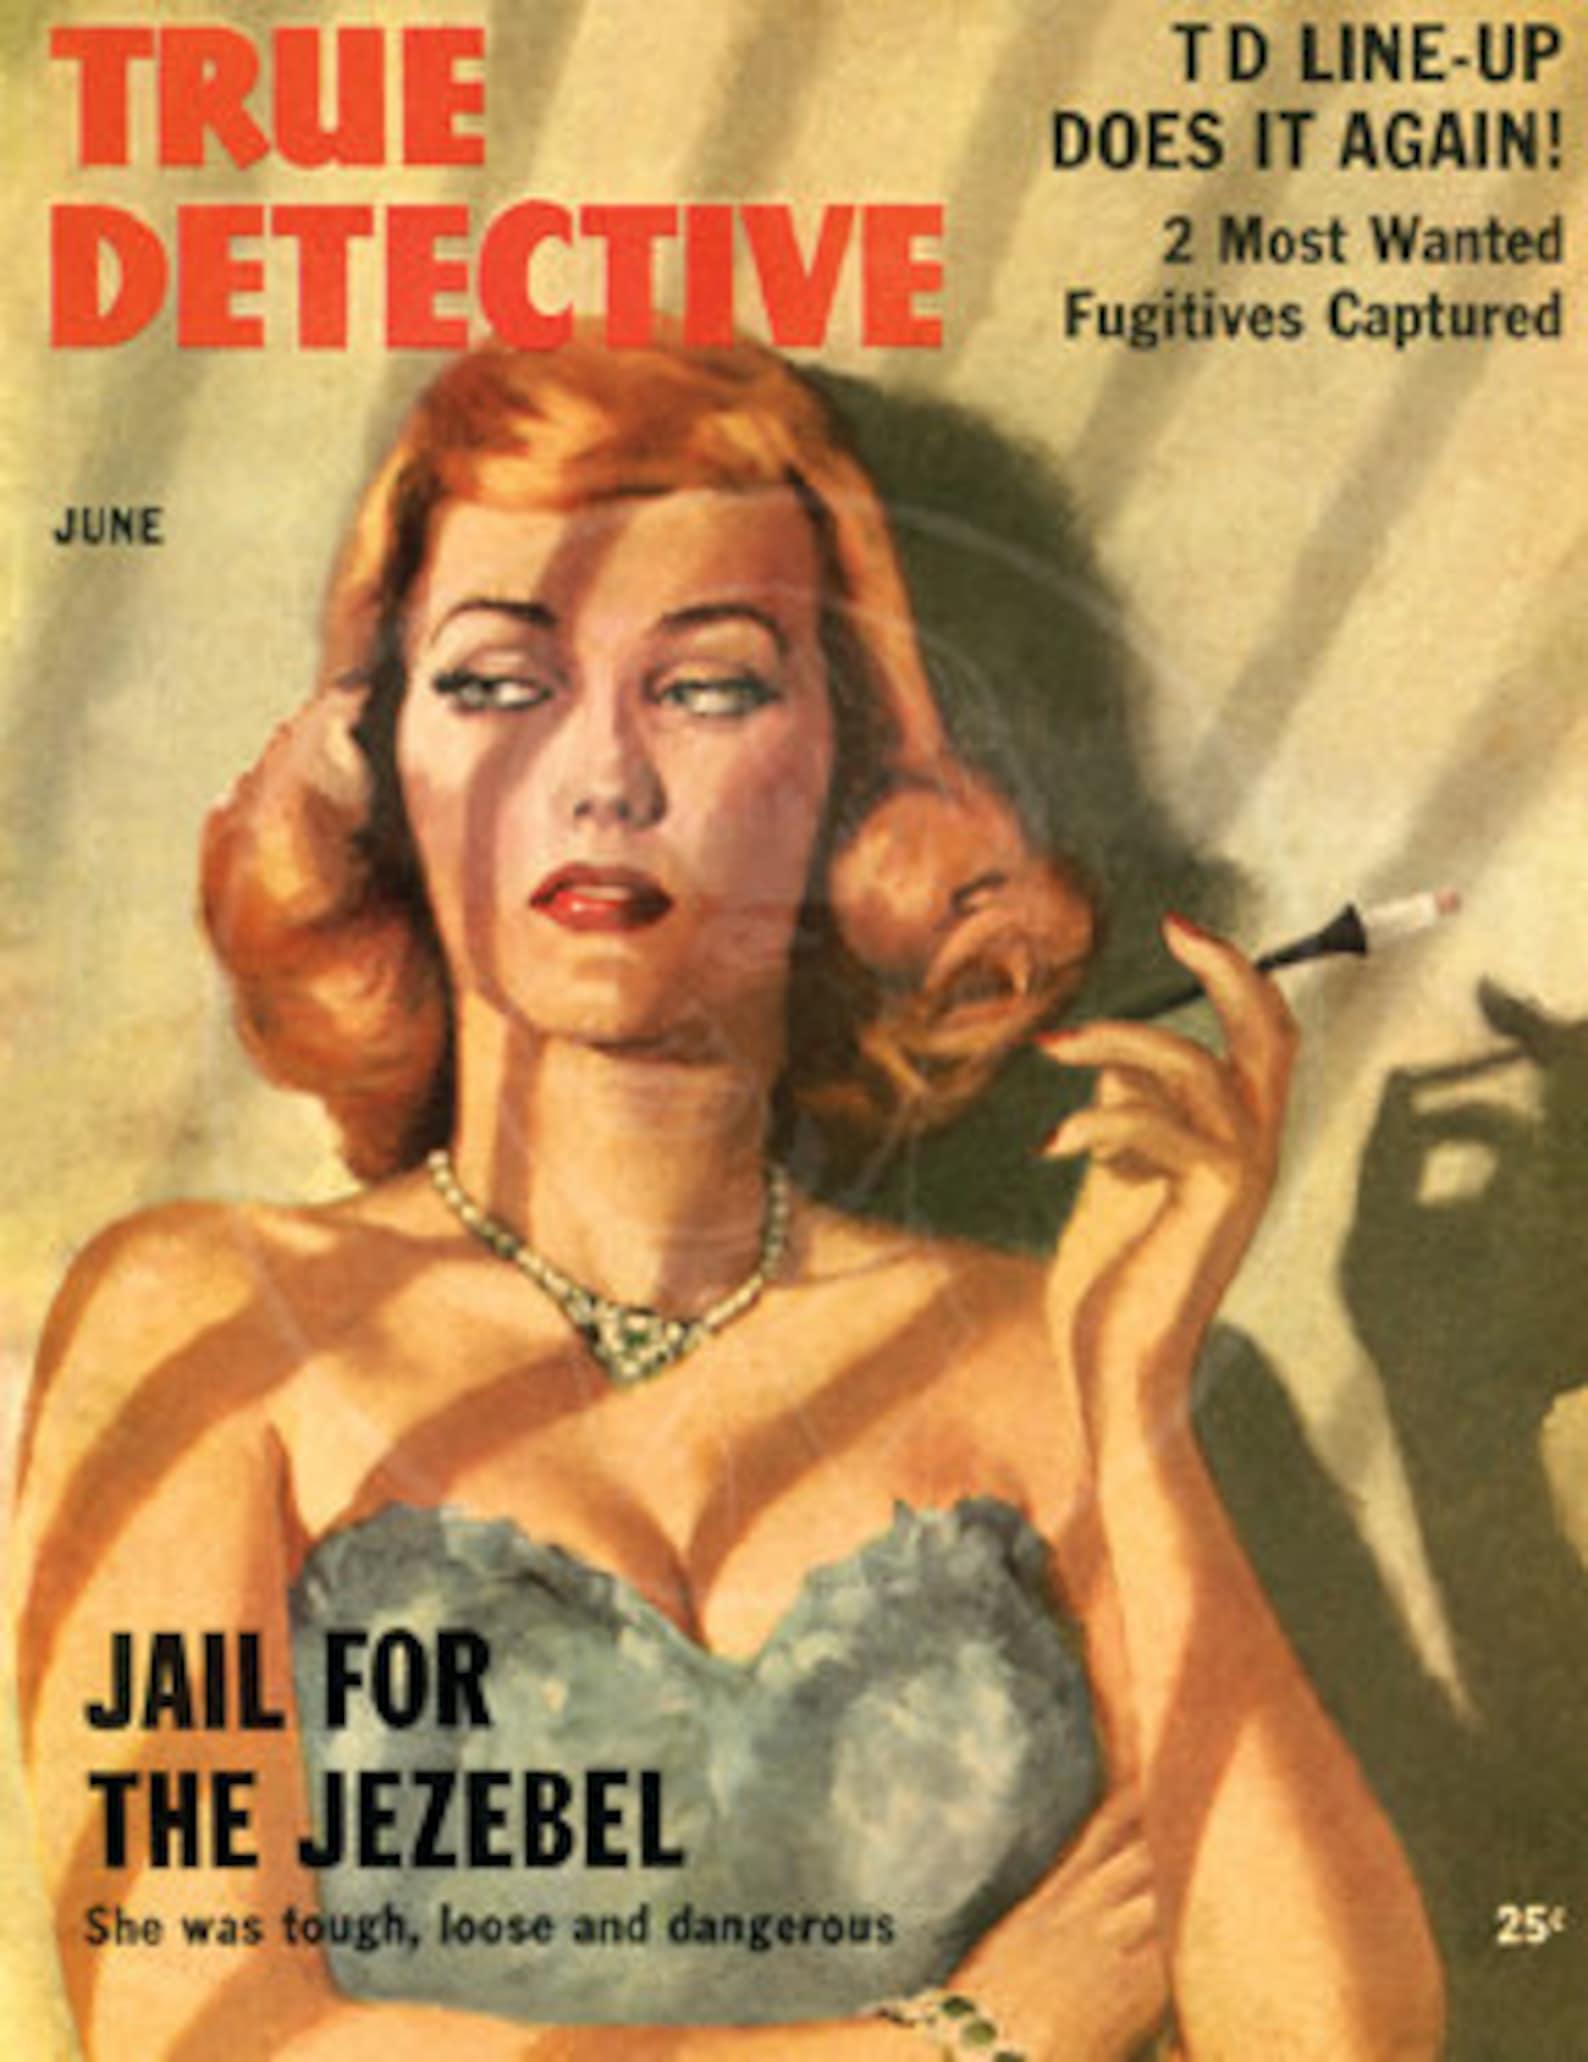 True Detective - June 2021 - Free Download PDF Magazines